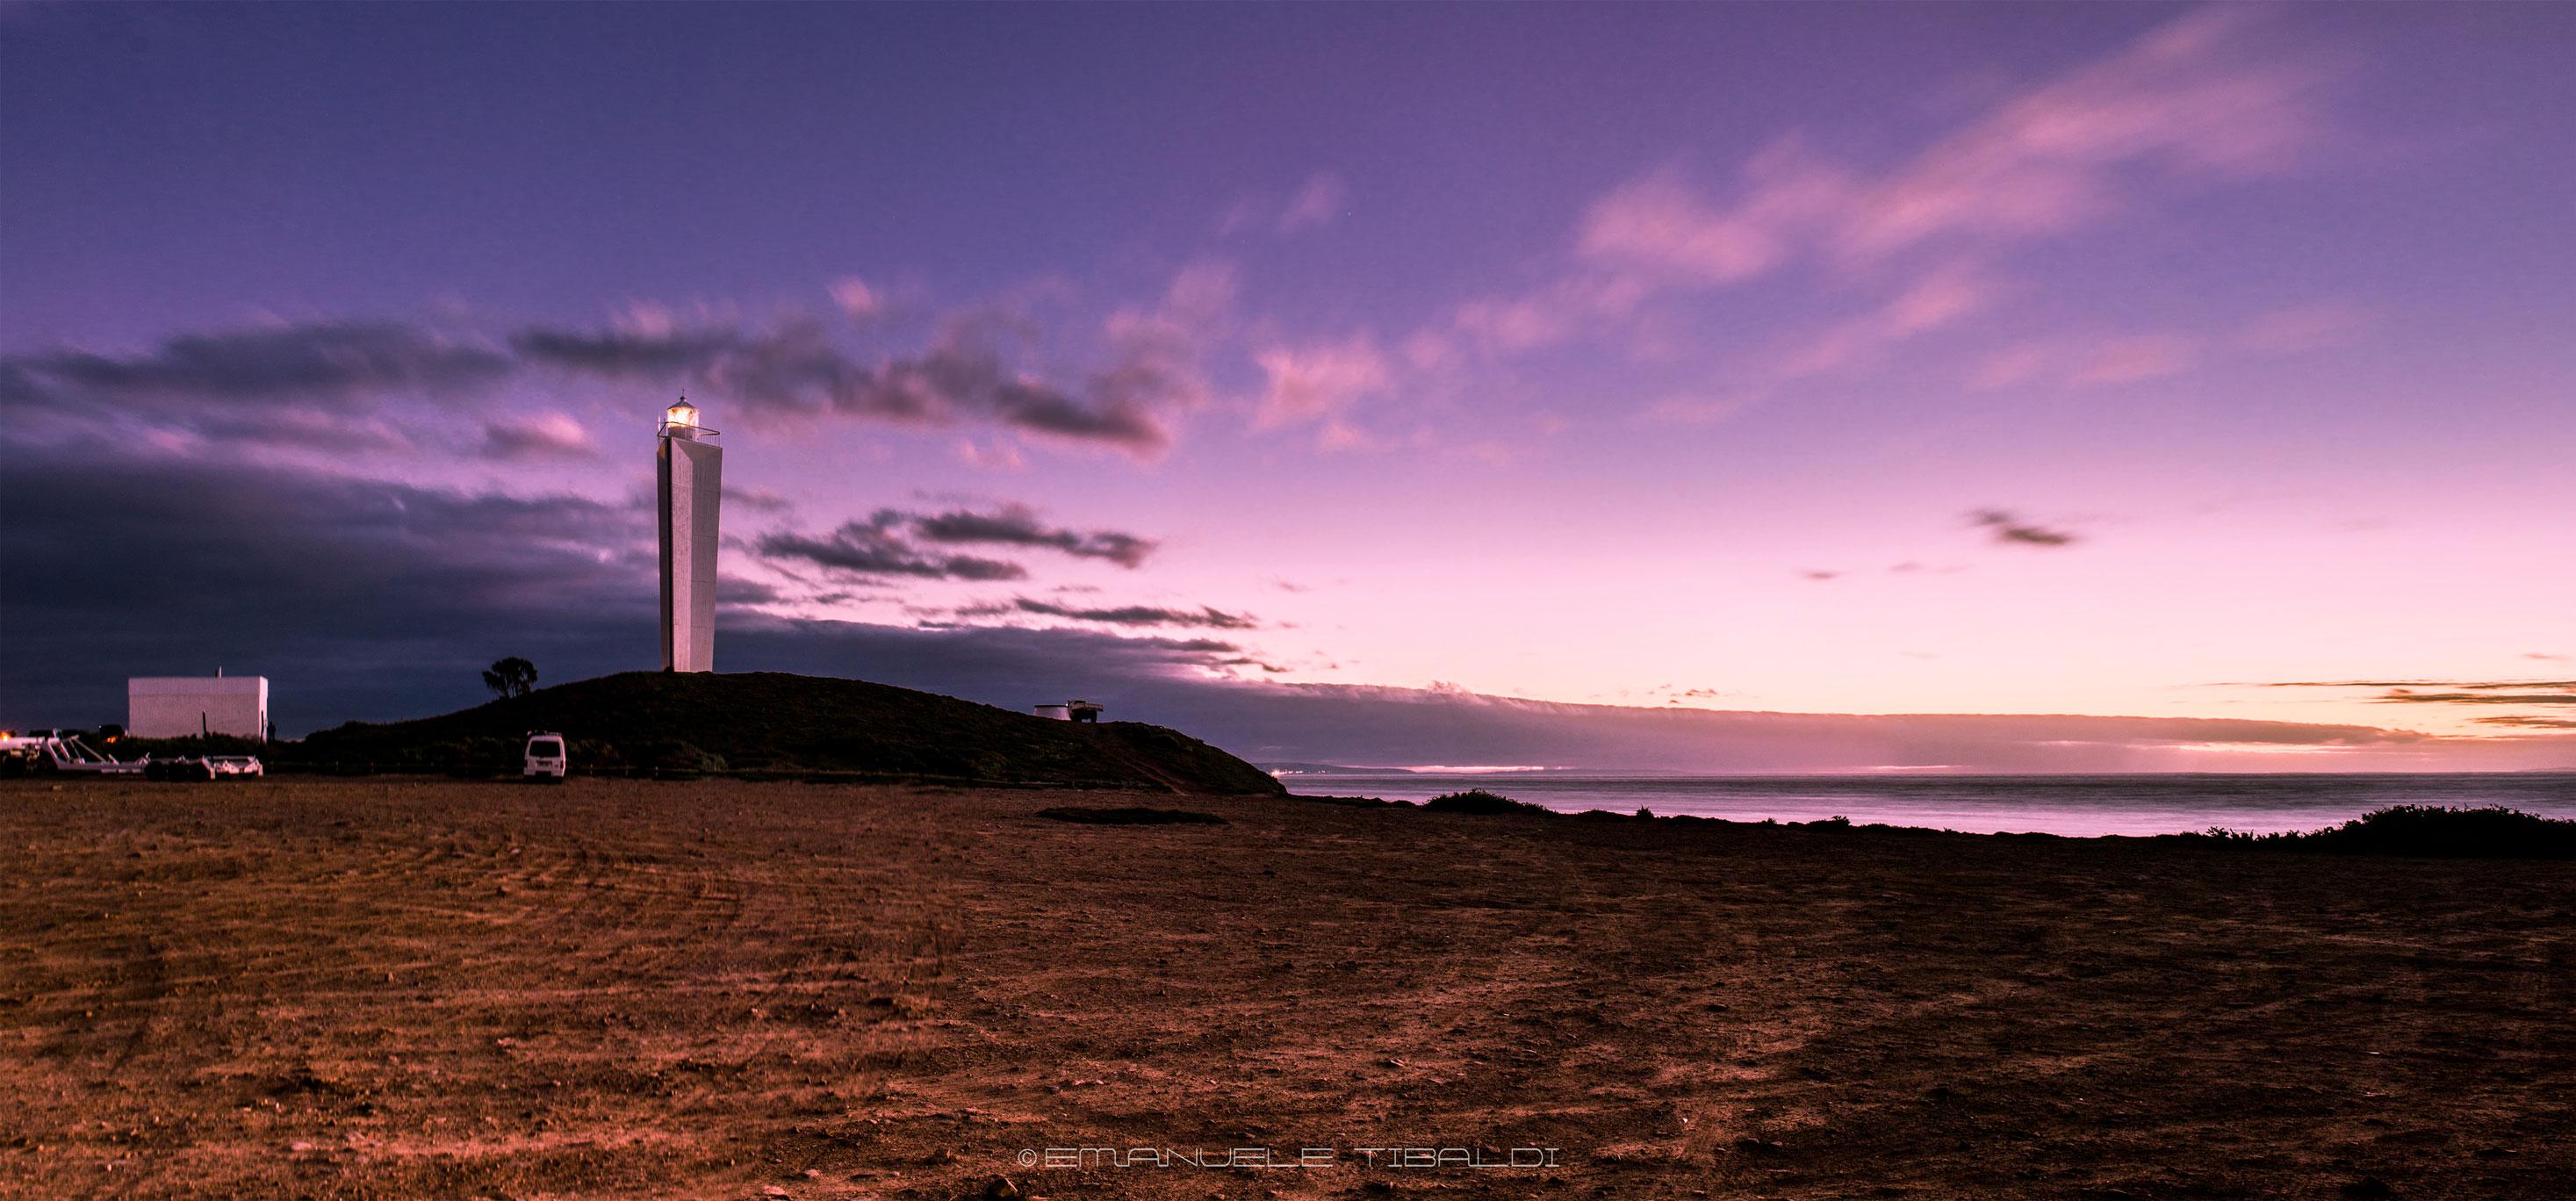 Paesaggi-Australia - DSC 4758  - Fotografie tramonto Australia - Fotografie tramonto Australia